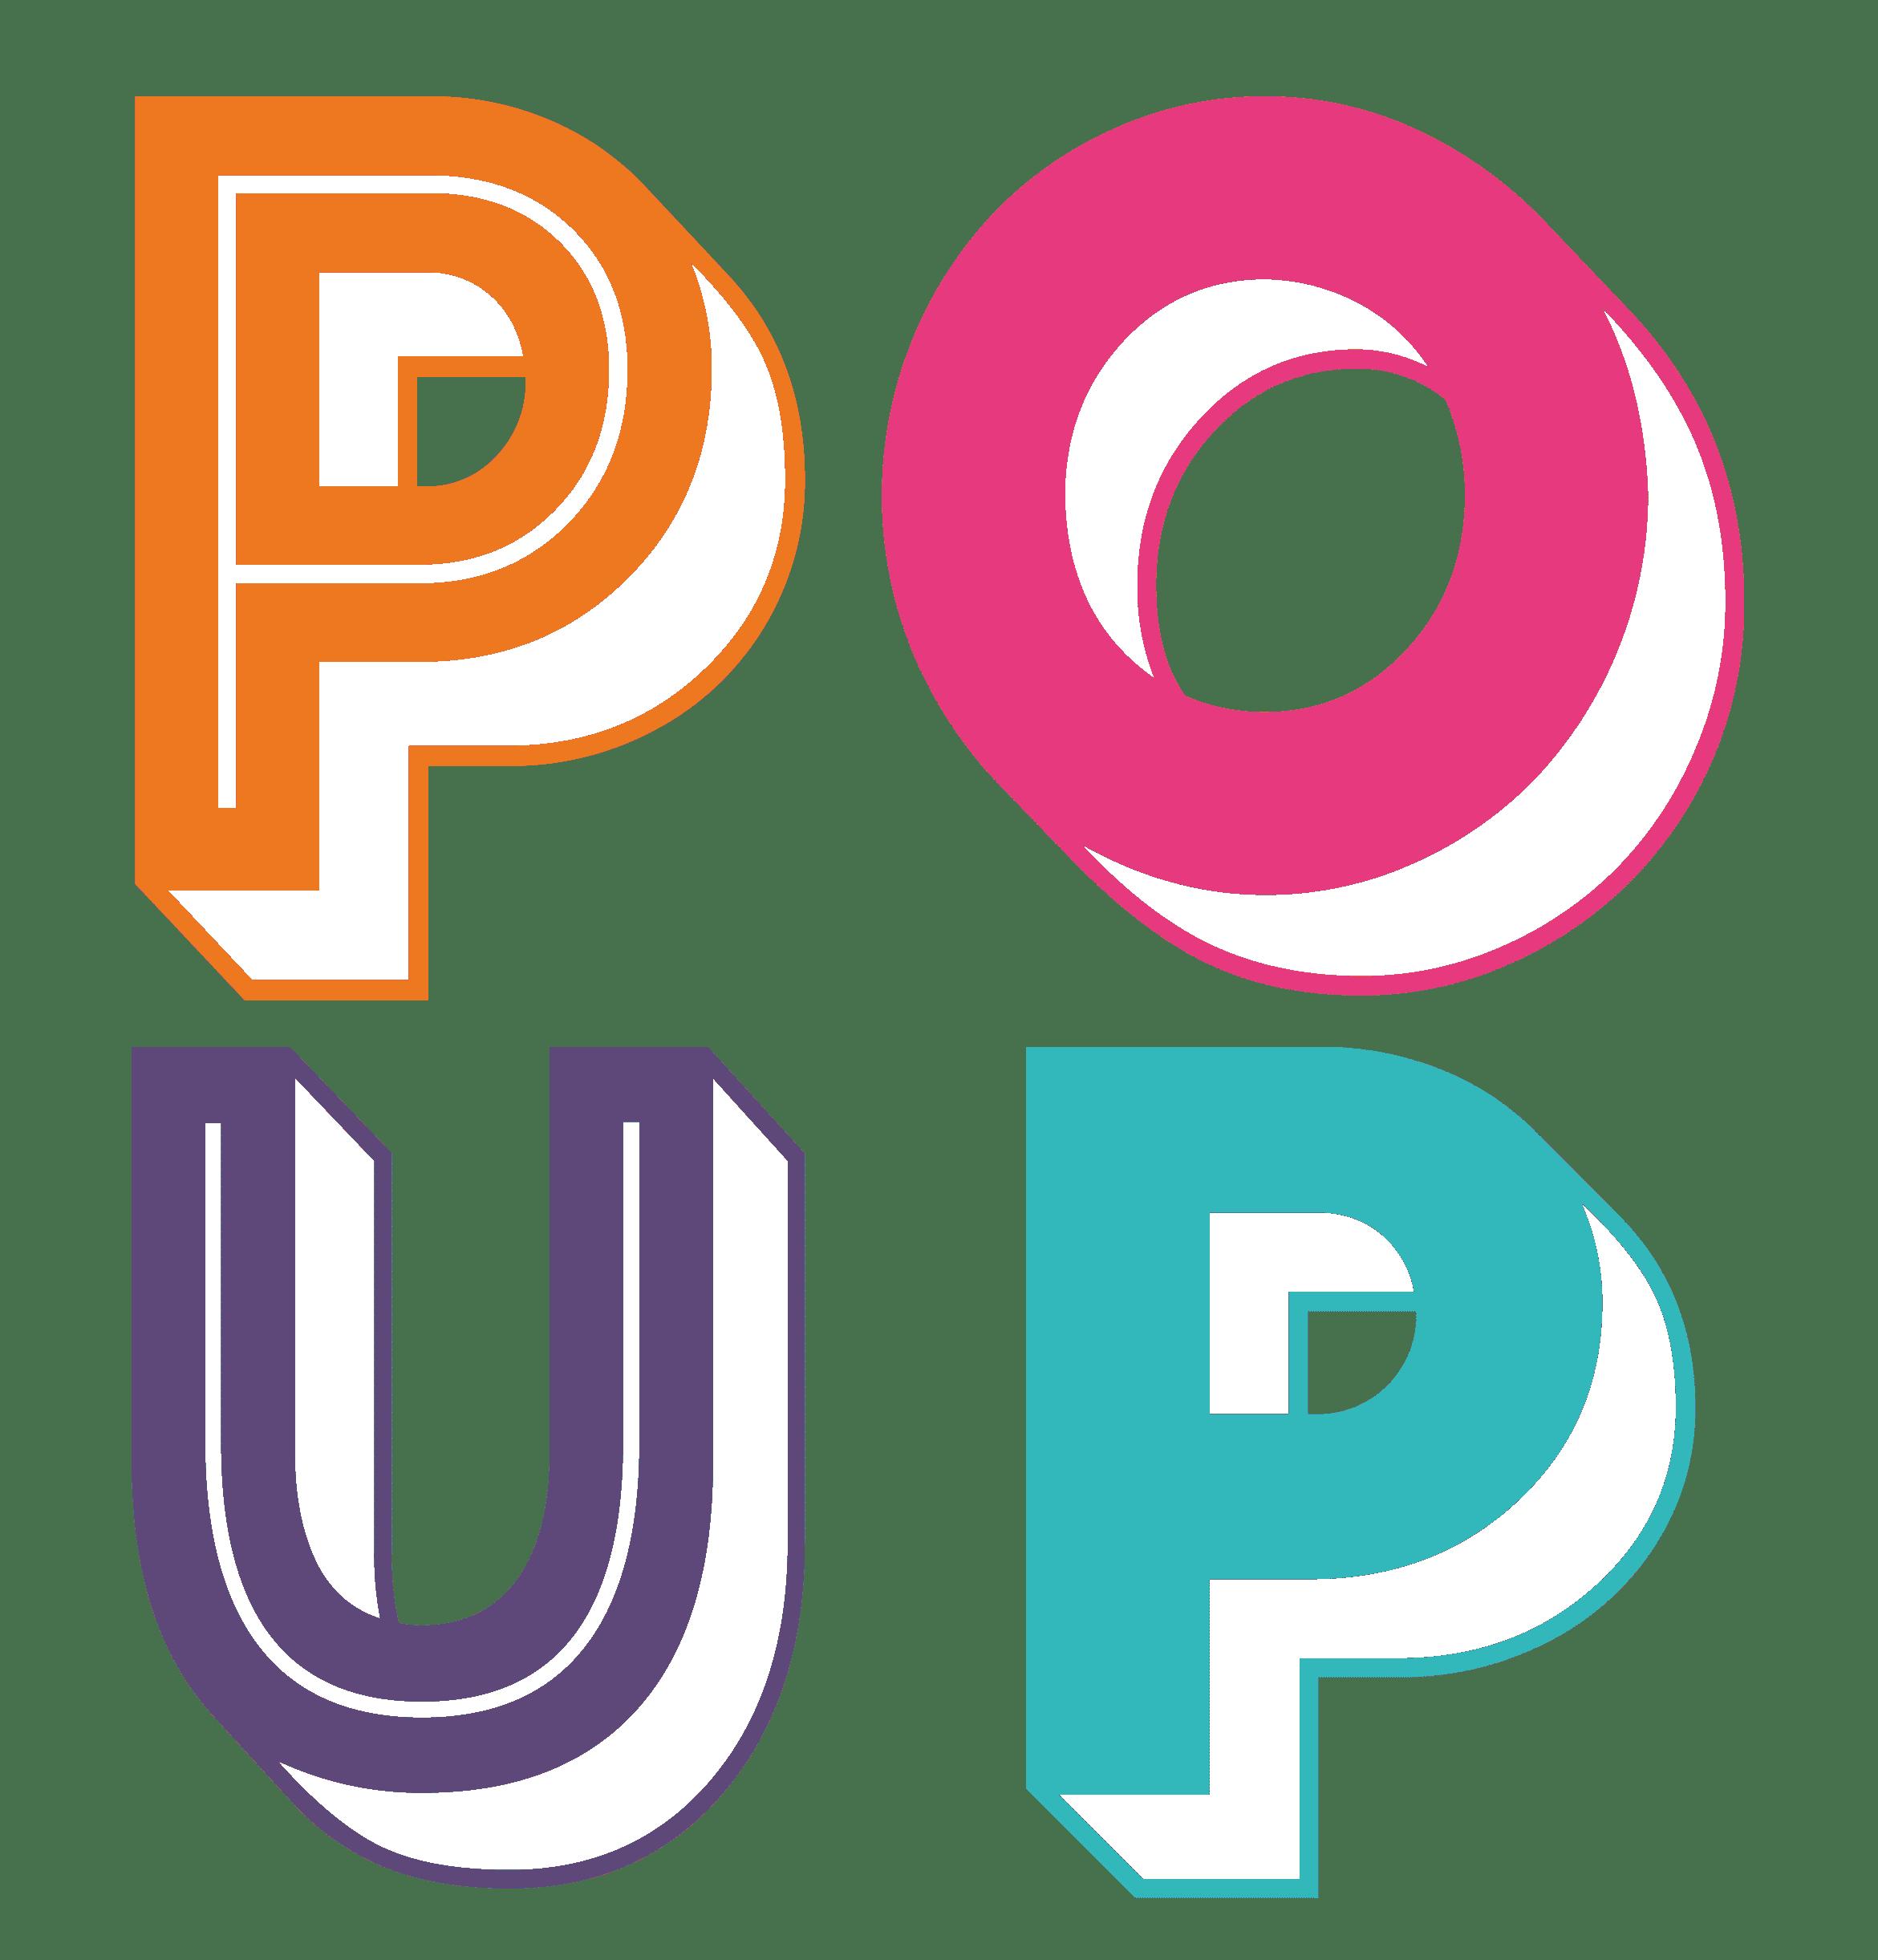 logo-esprit-pop-up-interieur-blanc